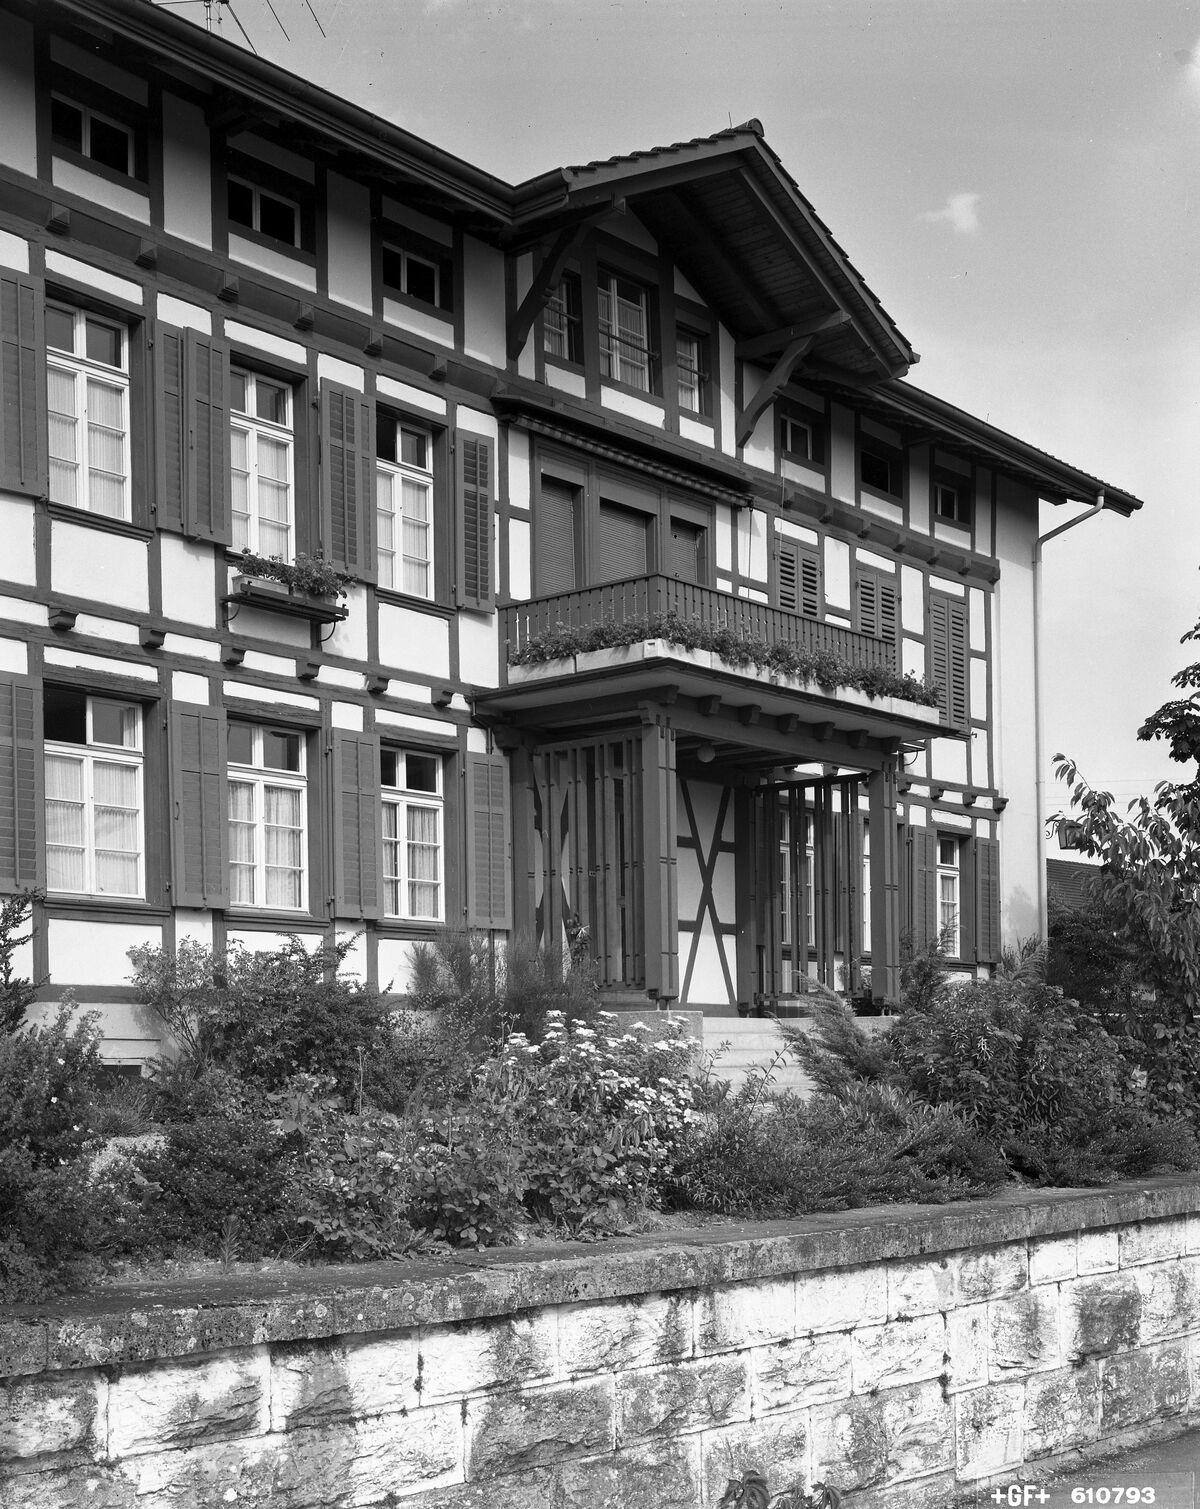 GFA 17/610793.2: Apprentices' home Dachsen